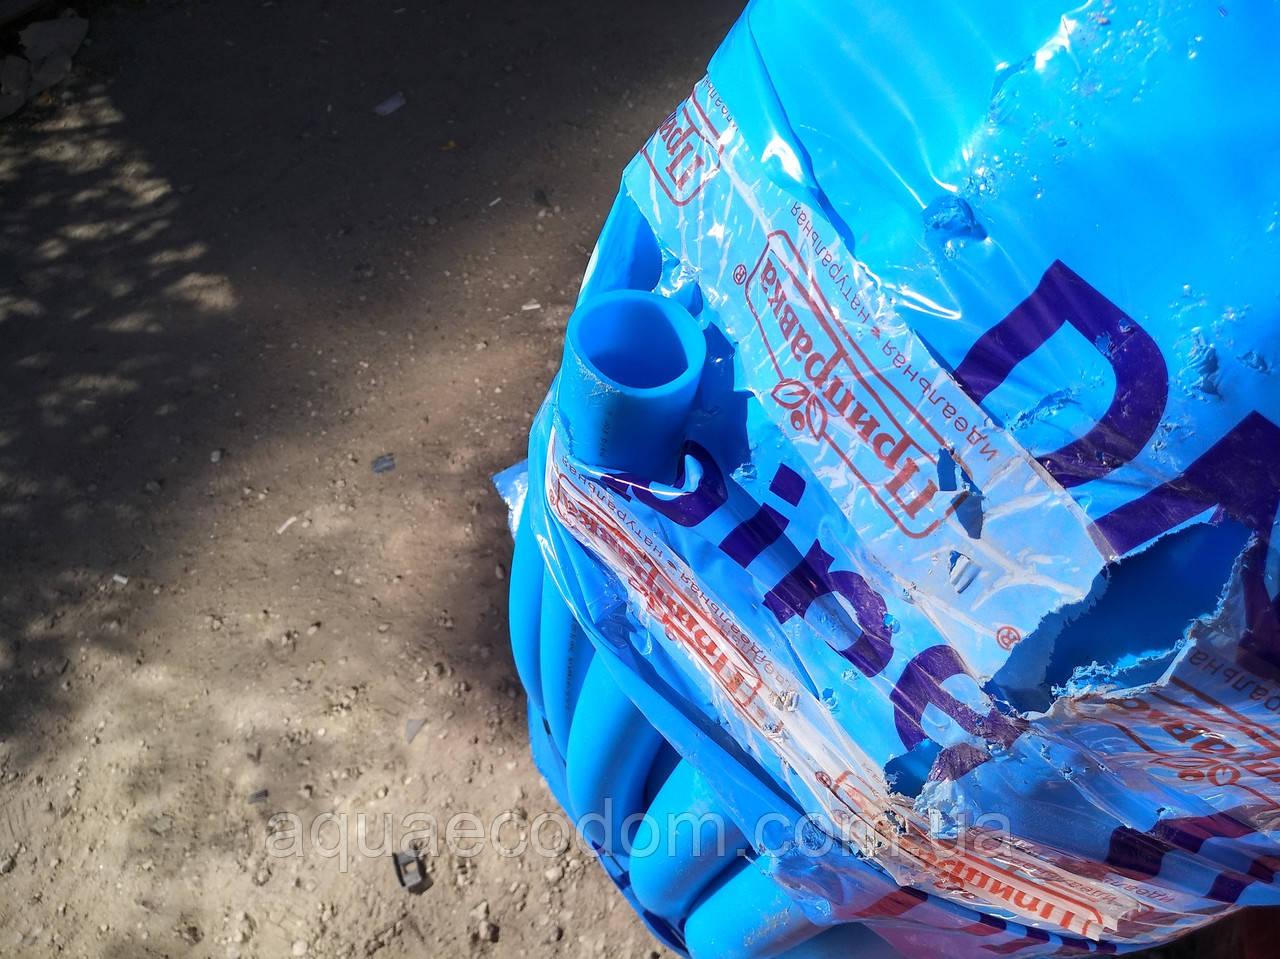 Харчова труба поліетиленова 40 мм 16 атм (синя)